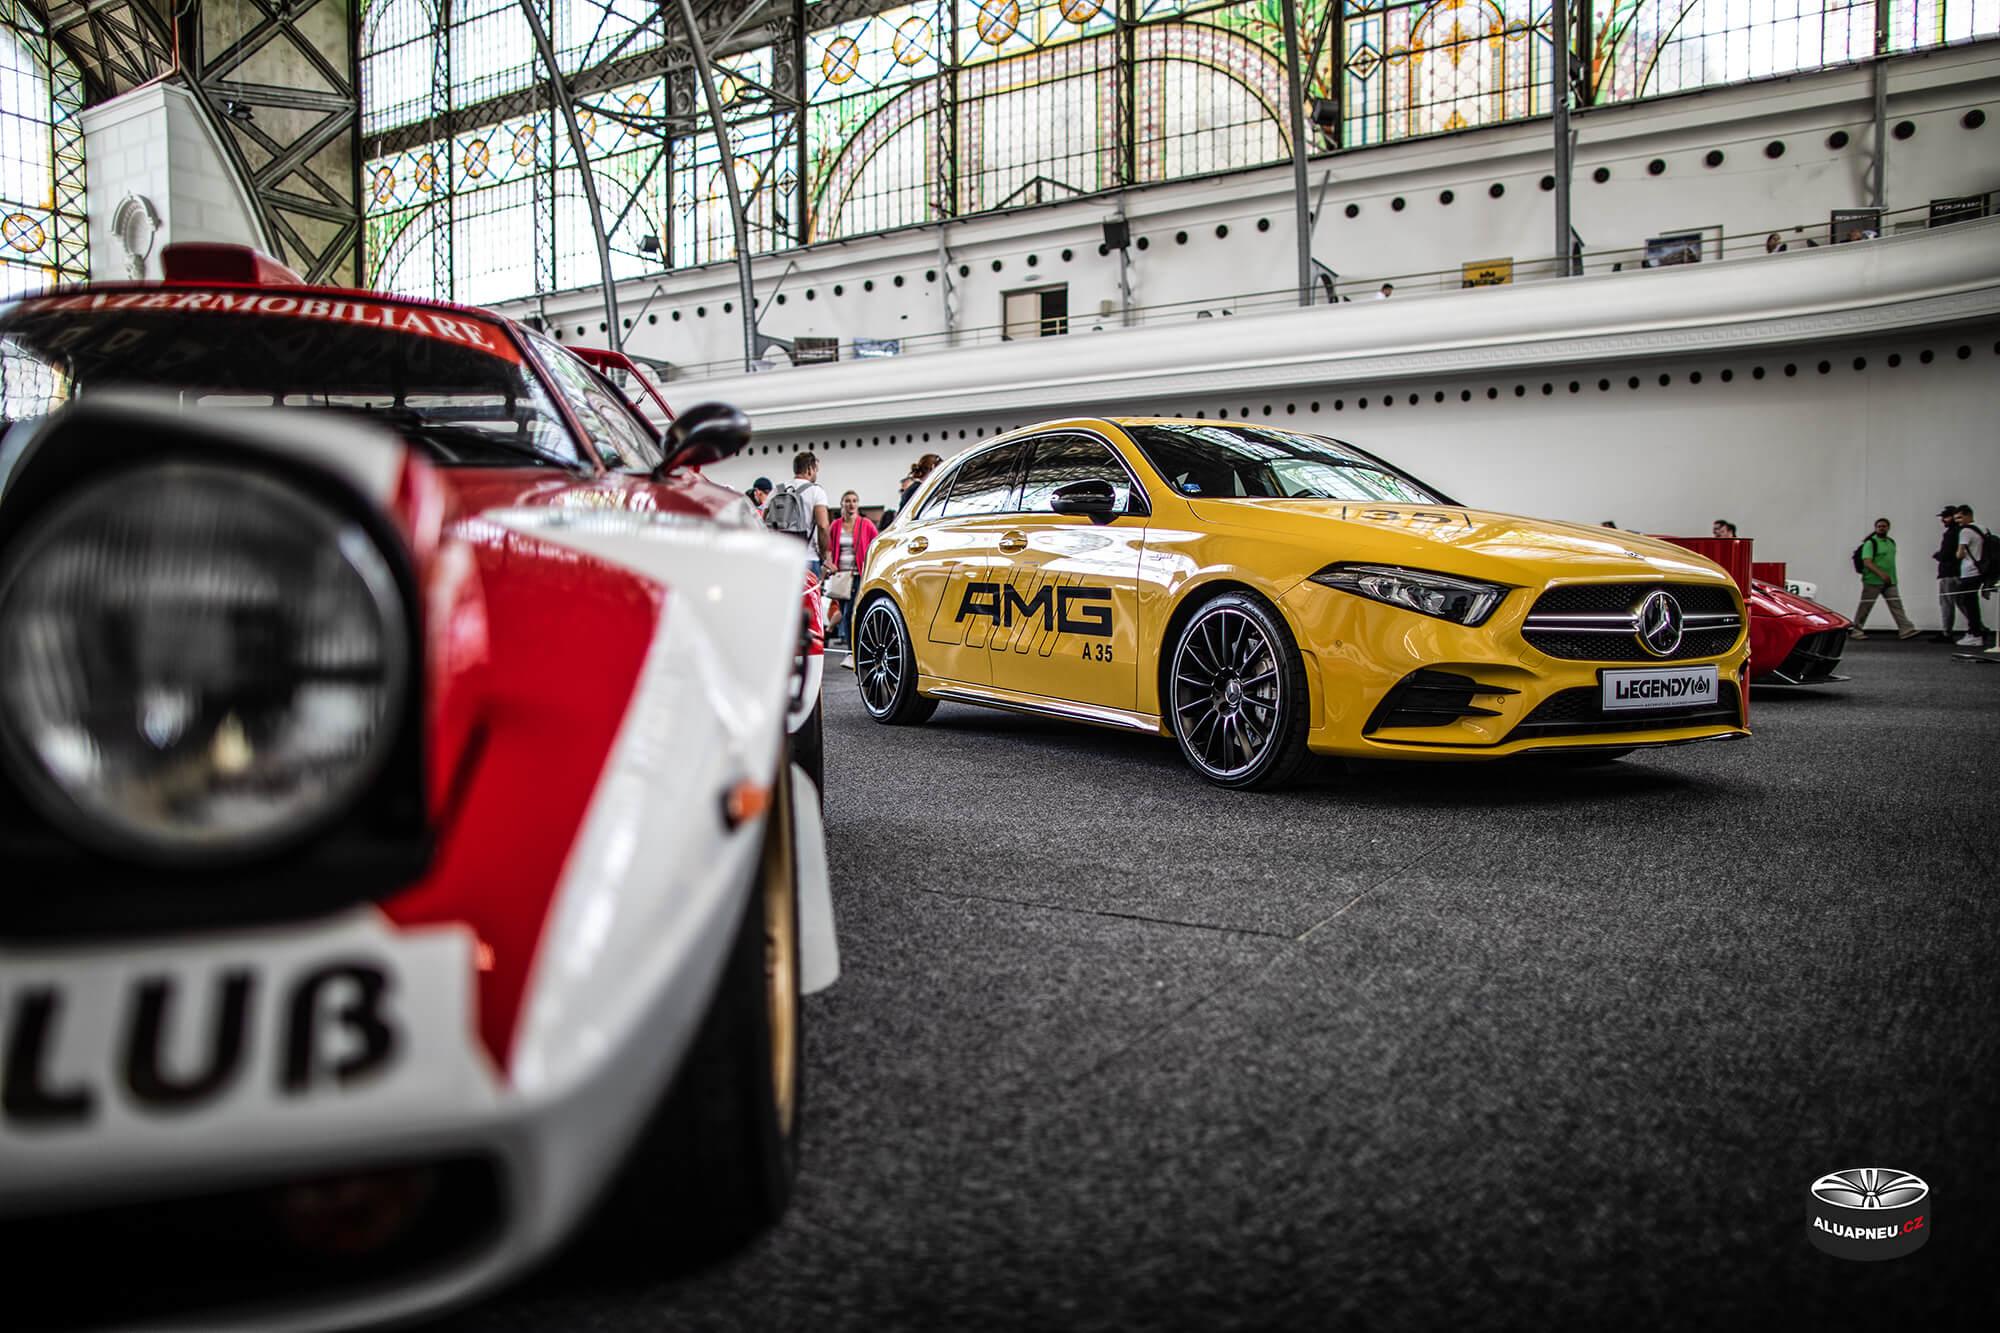 Černé elektrony AMG Mercedes - Automobilové Legendy 2019 - www.aluapneu.cz